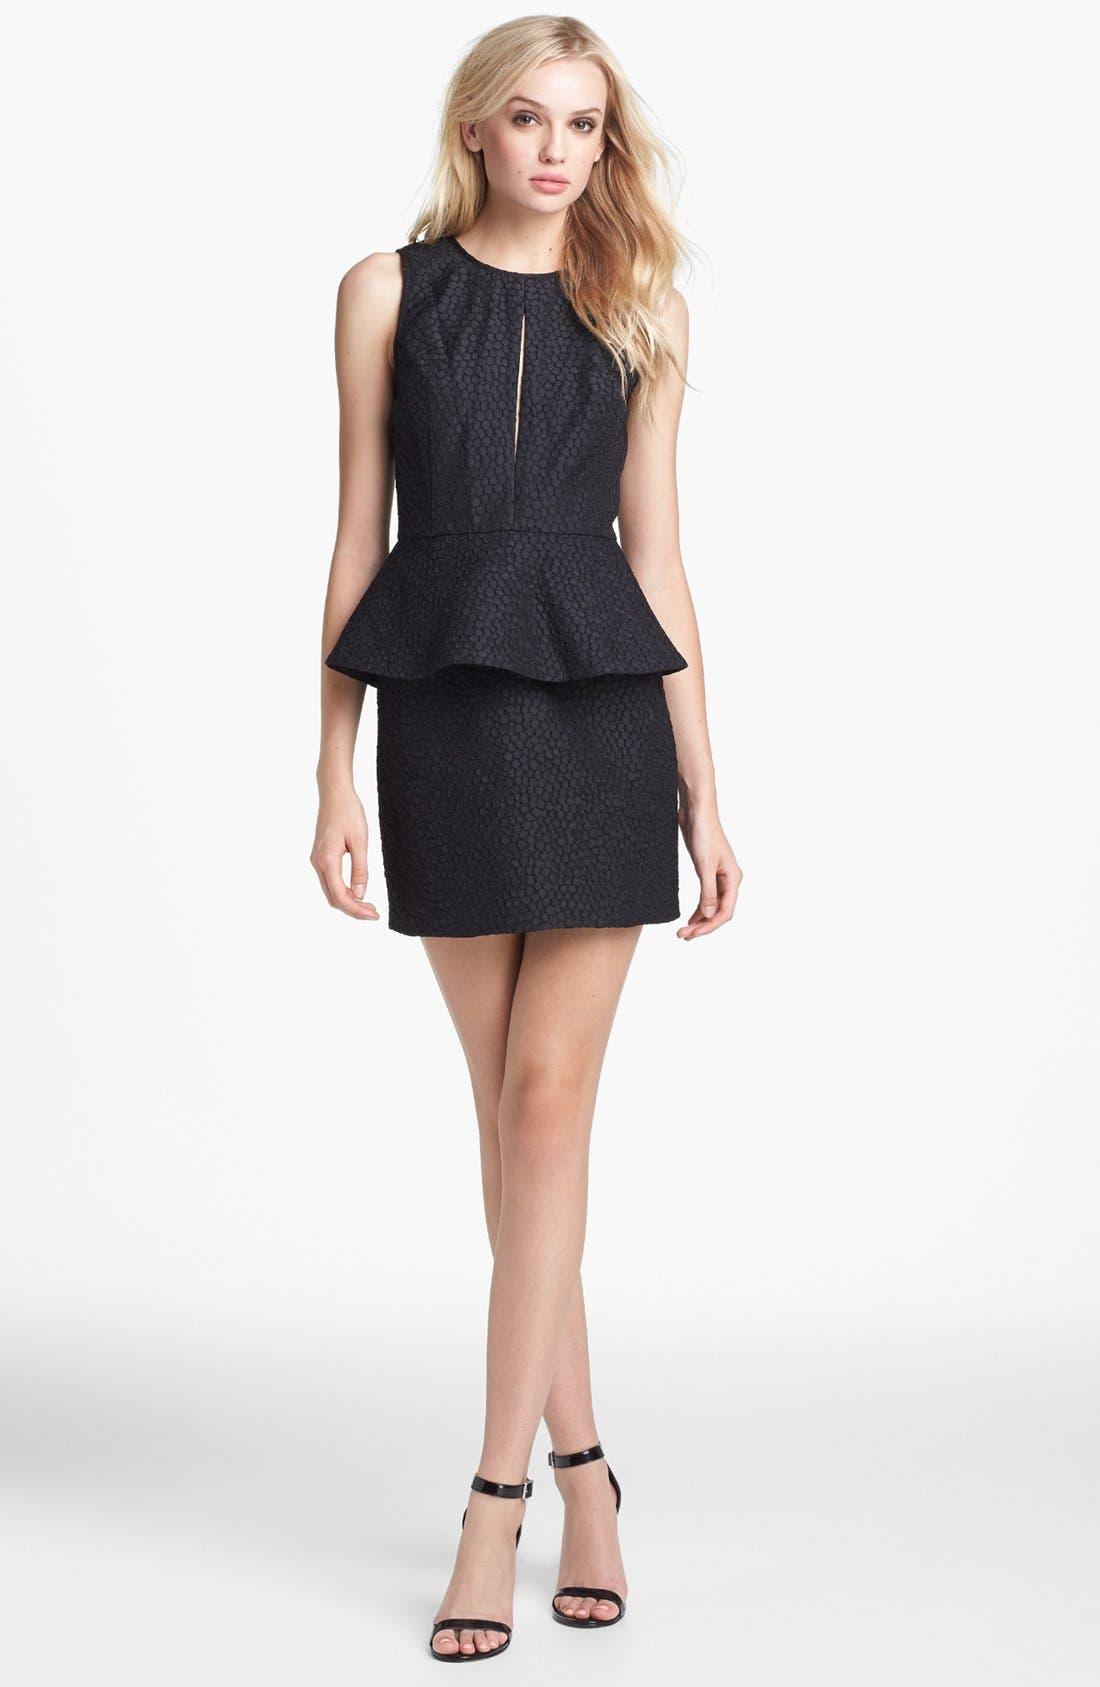 Alternate Image 1 Selected - Keepsake the Label 'In Your Light' Jacquard Peplum Sheath Dress